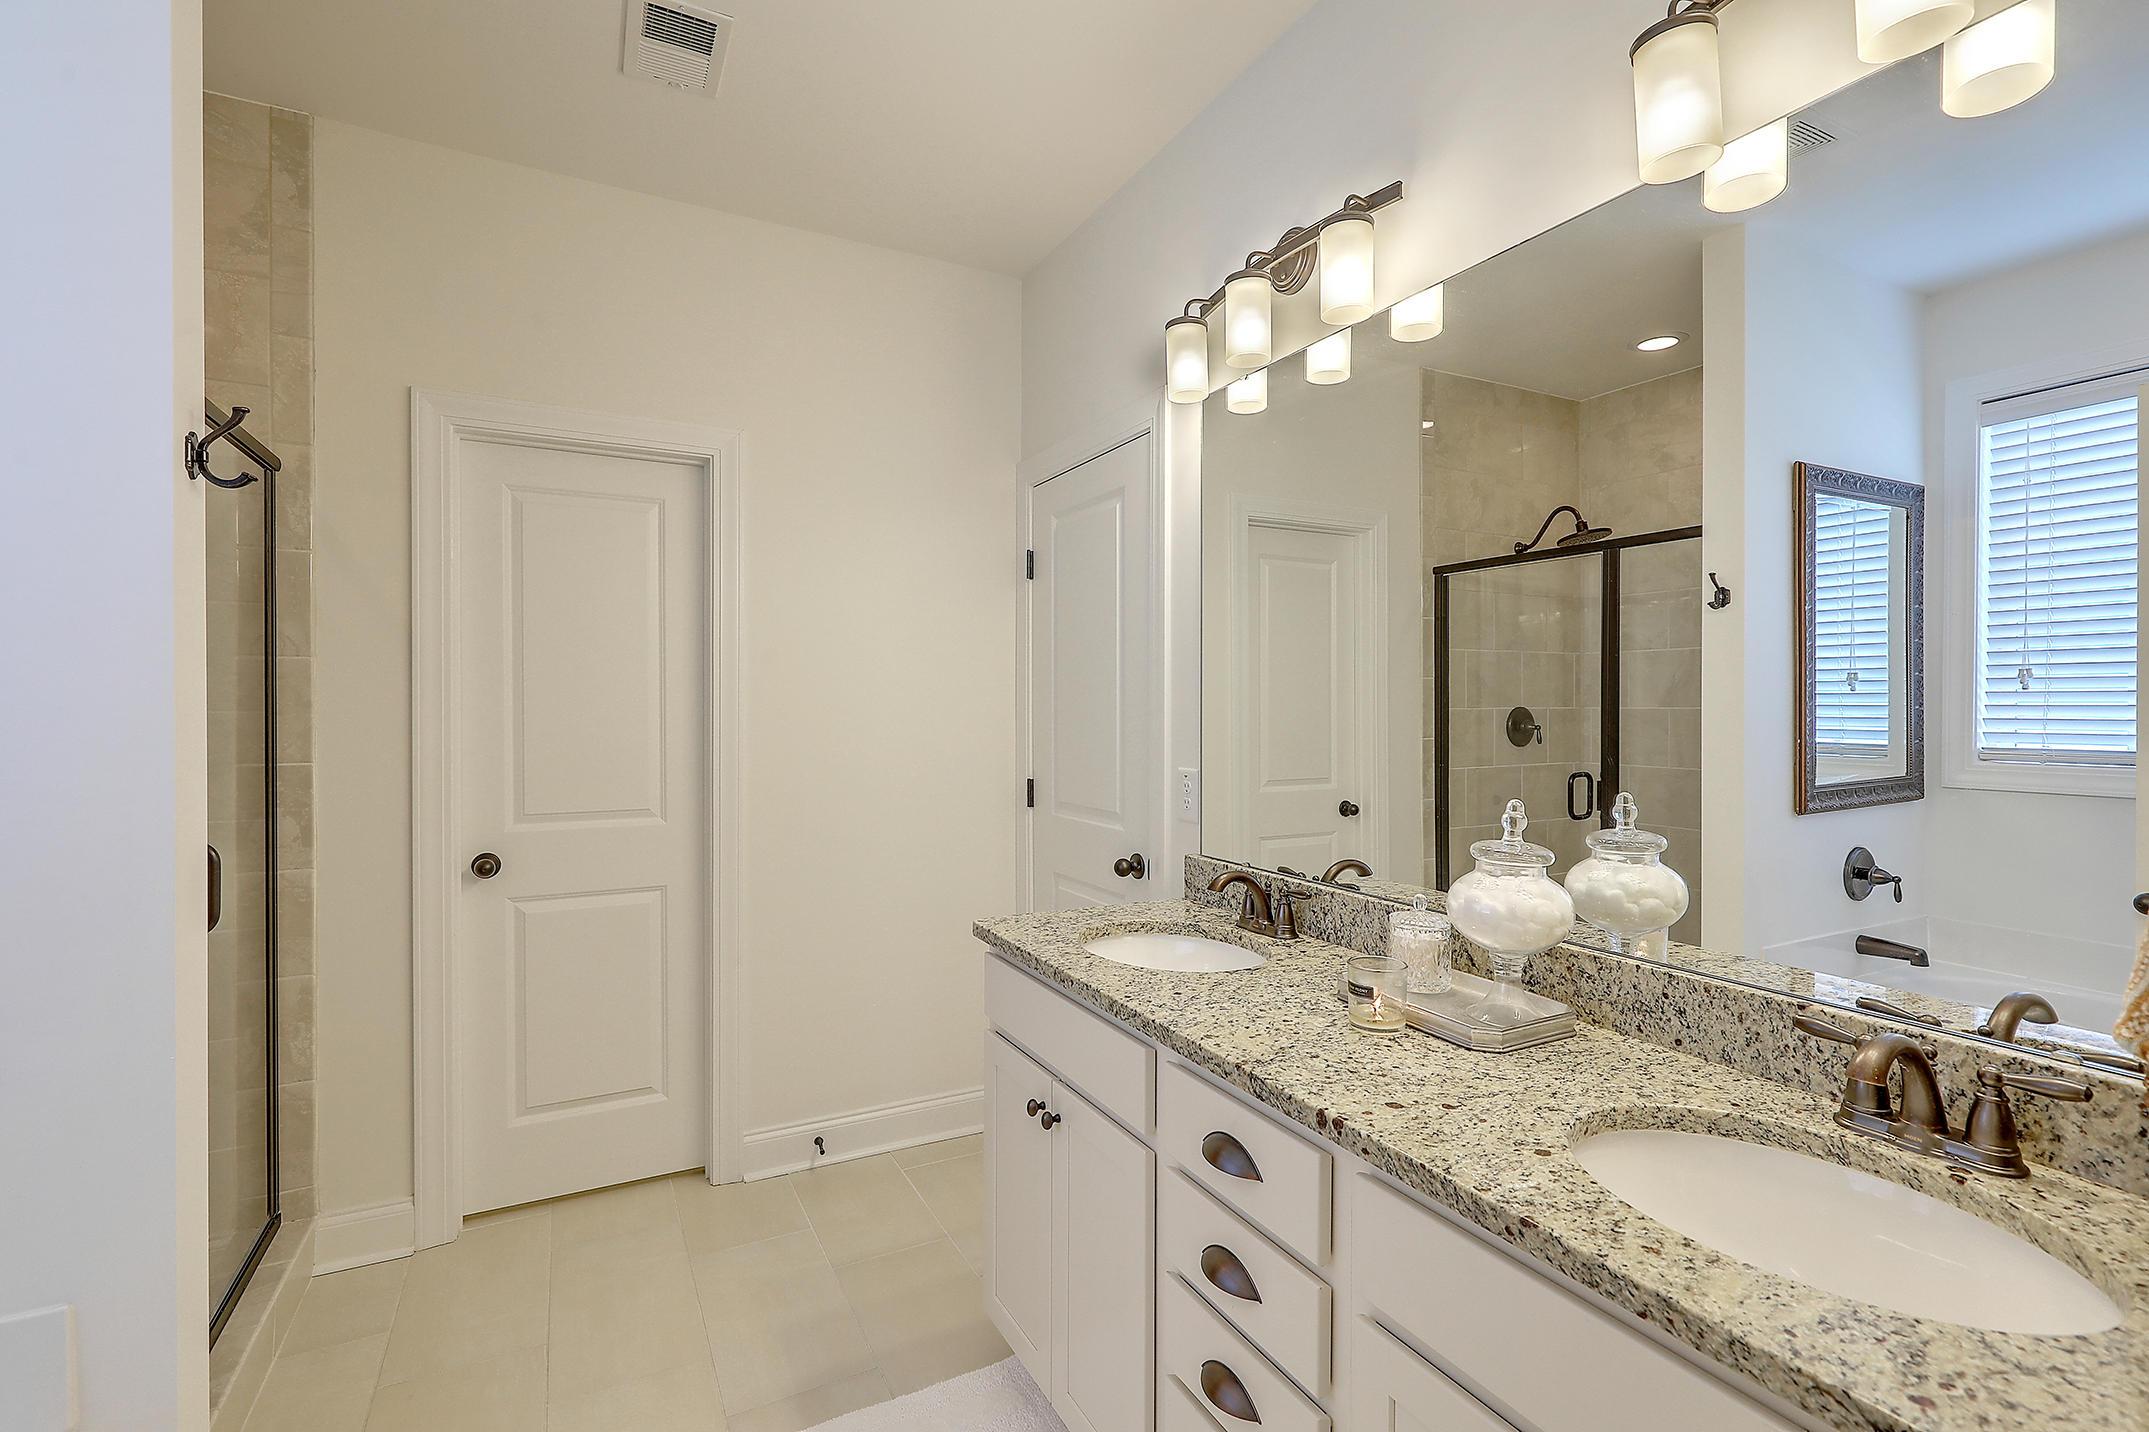 Park West Homes For Sale - 3412 Salterbeck, Mount Pleasant, SC - 15